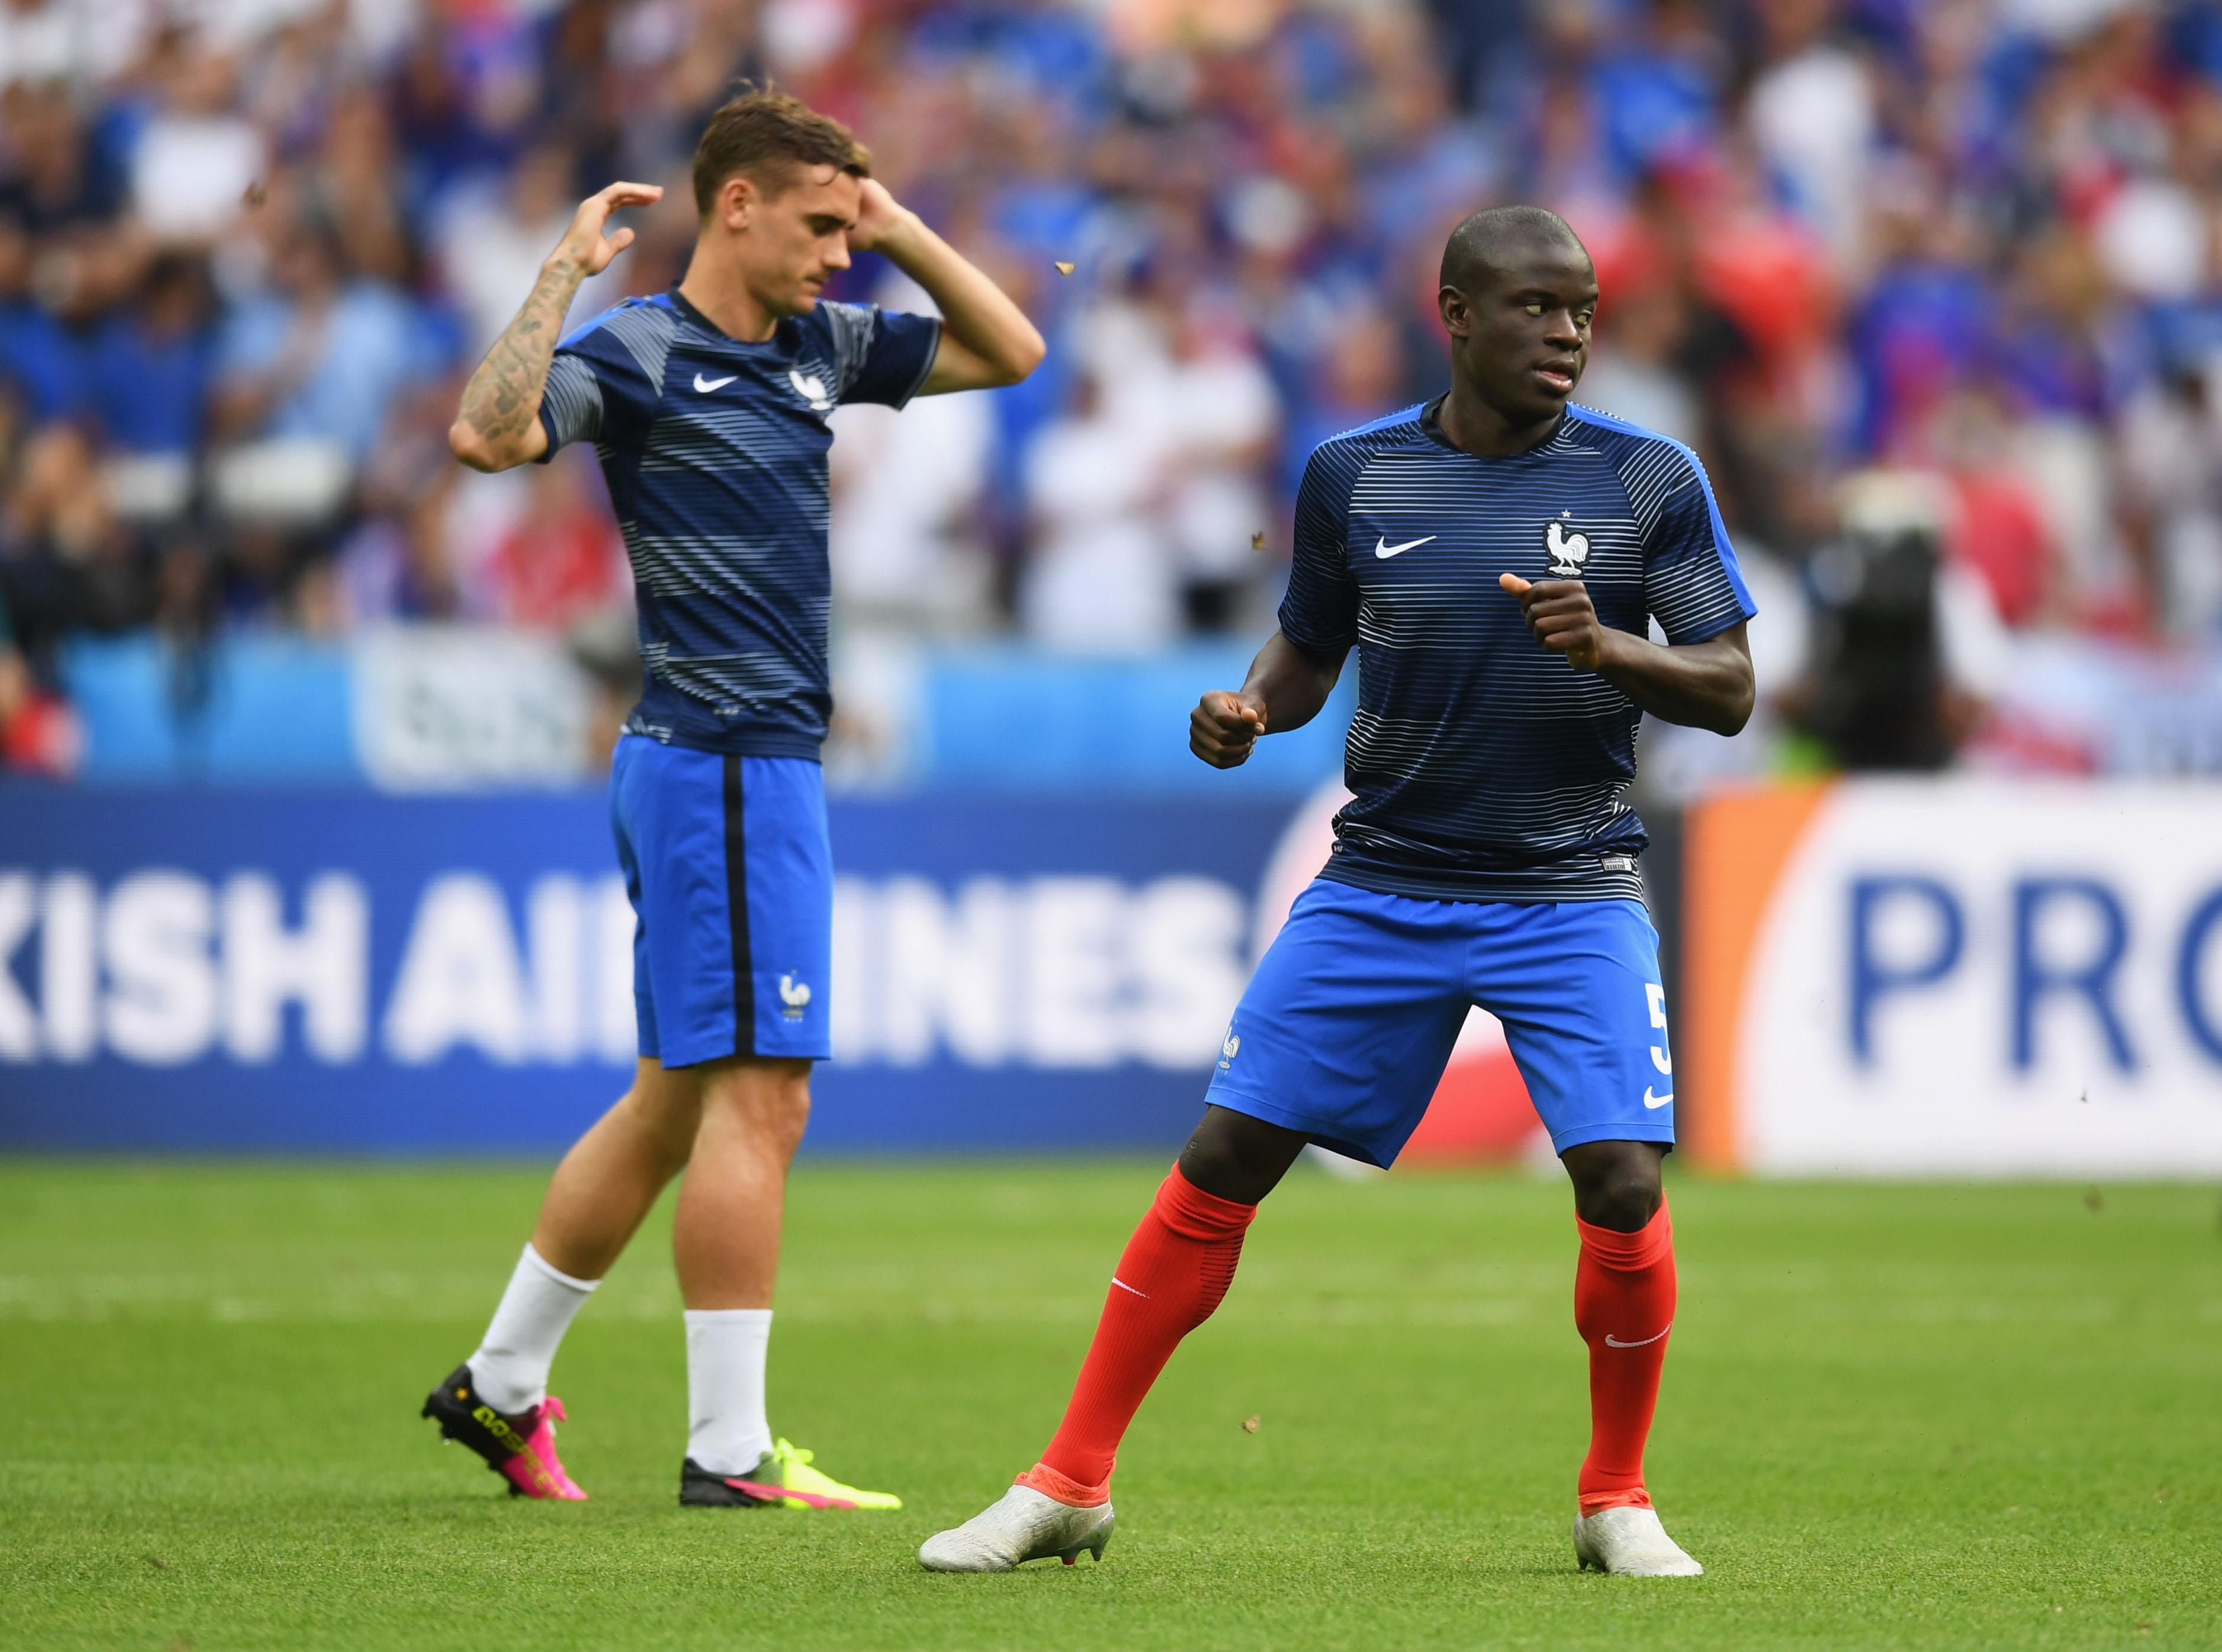 Chelsea's N'Golo Kante plays down Claude Makelele comparisons